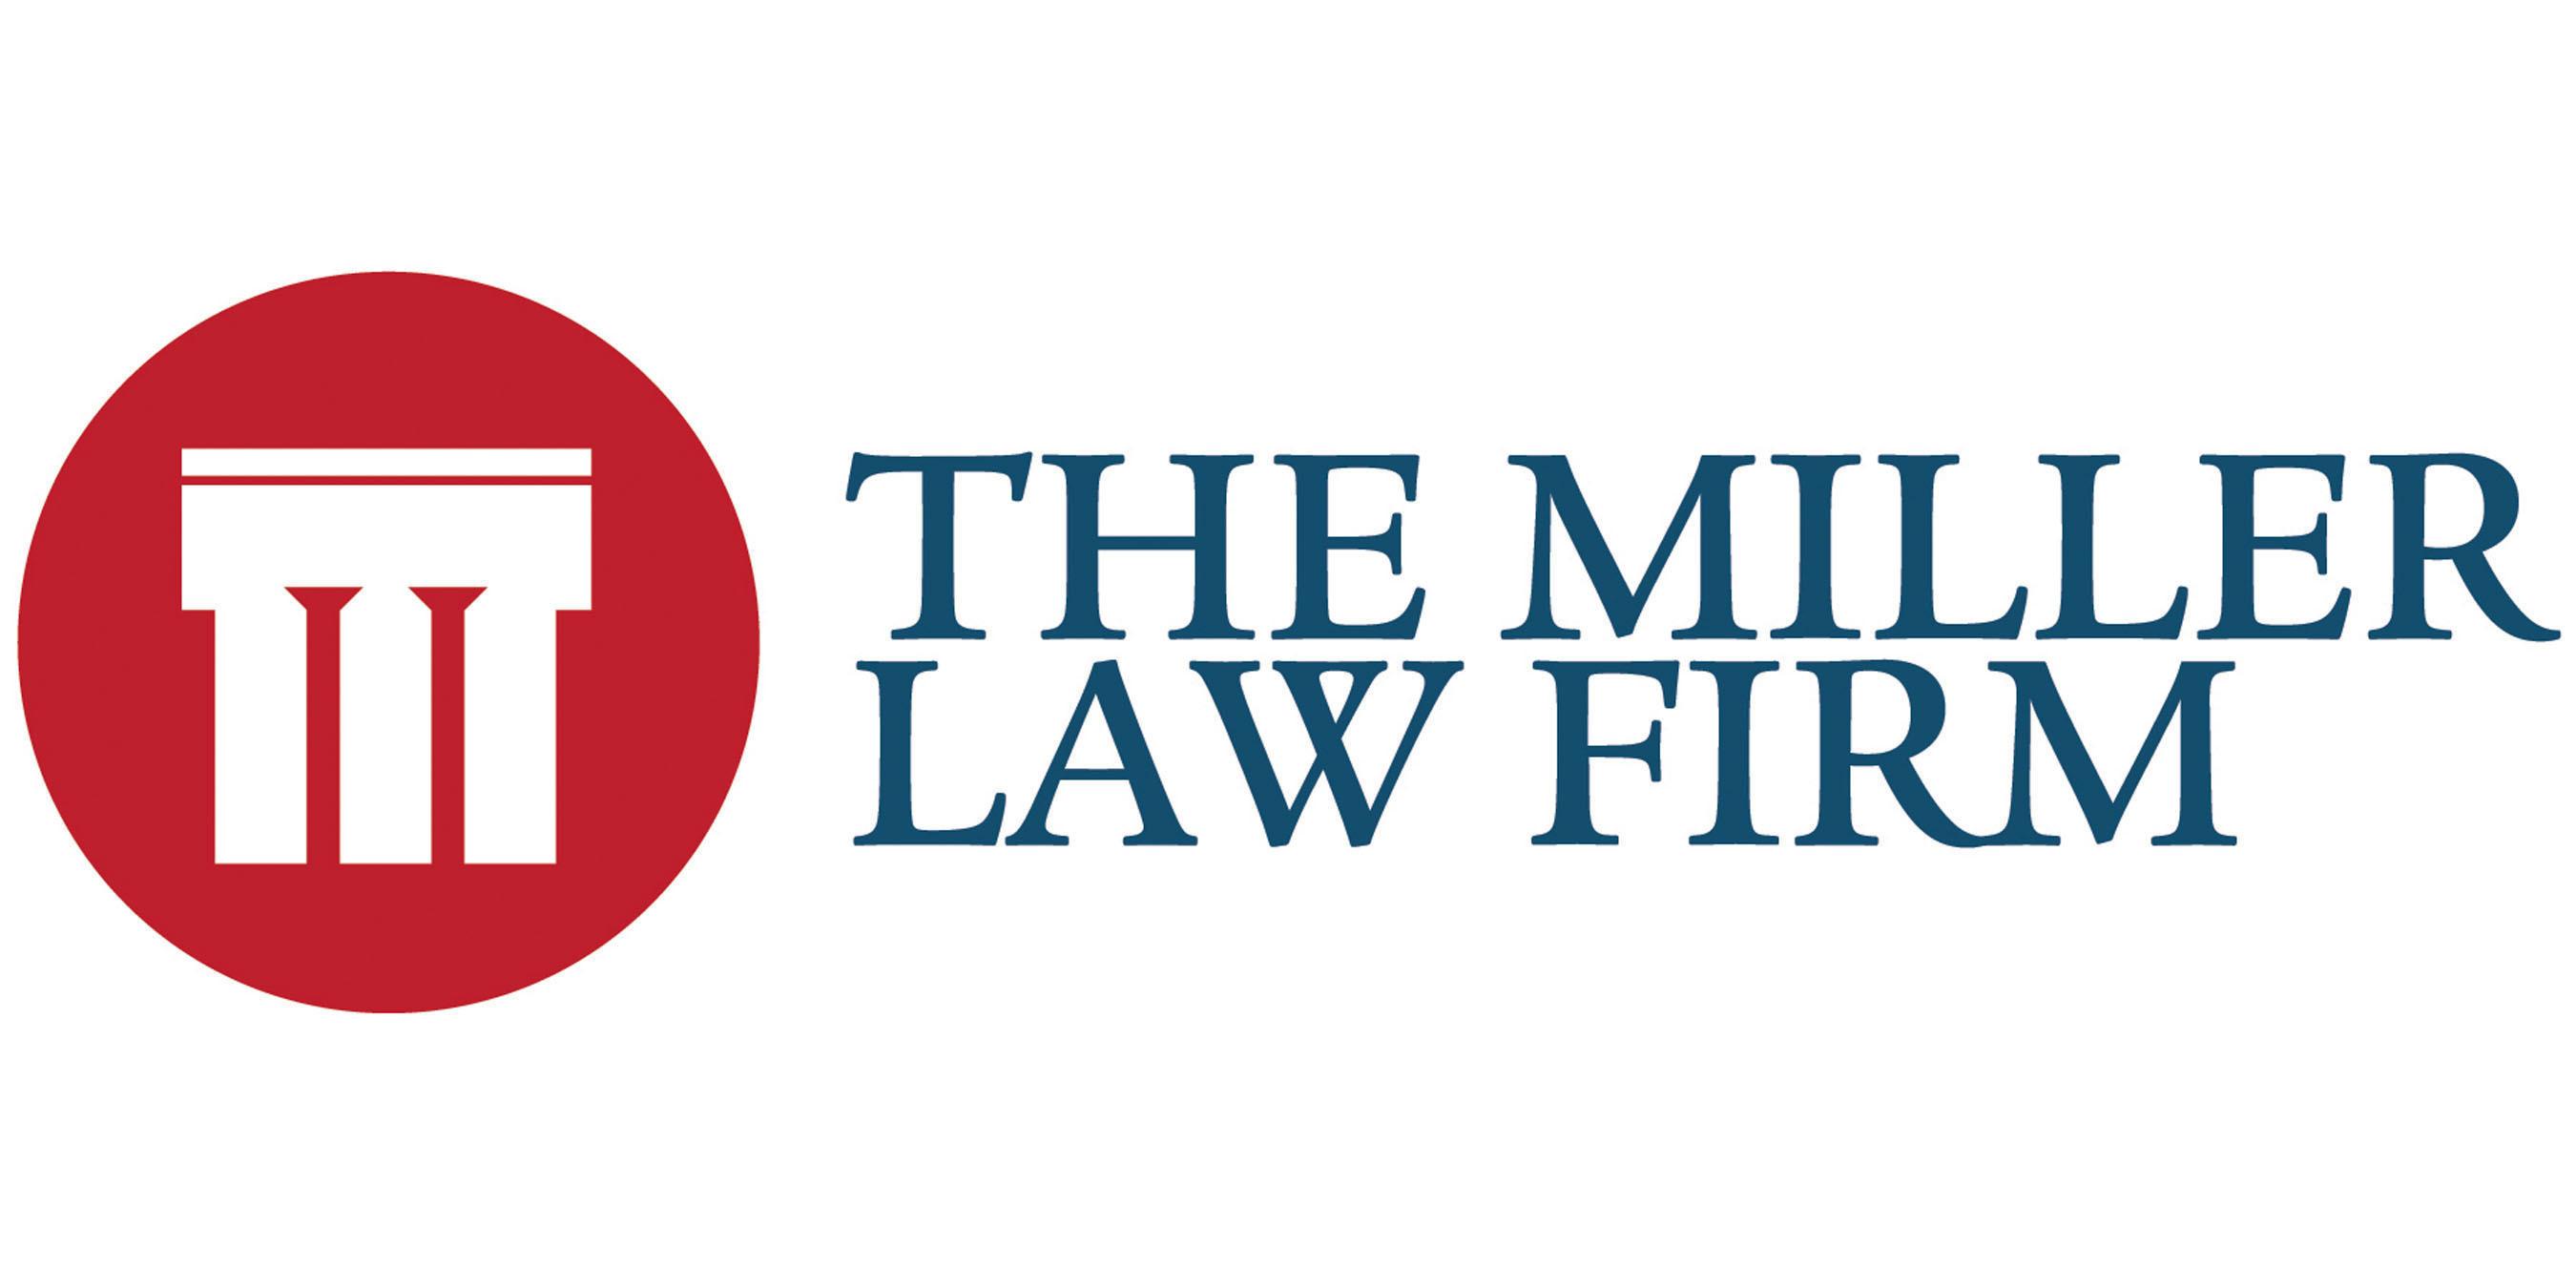 The Miller Law Firm logo. (PRNewsFoto/The Miller Law Firm) (PRNewsFoto/)